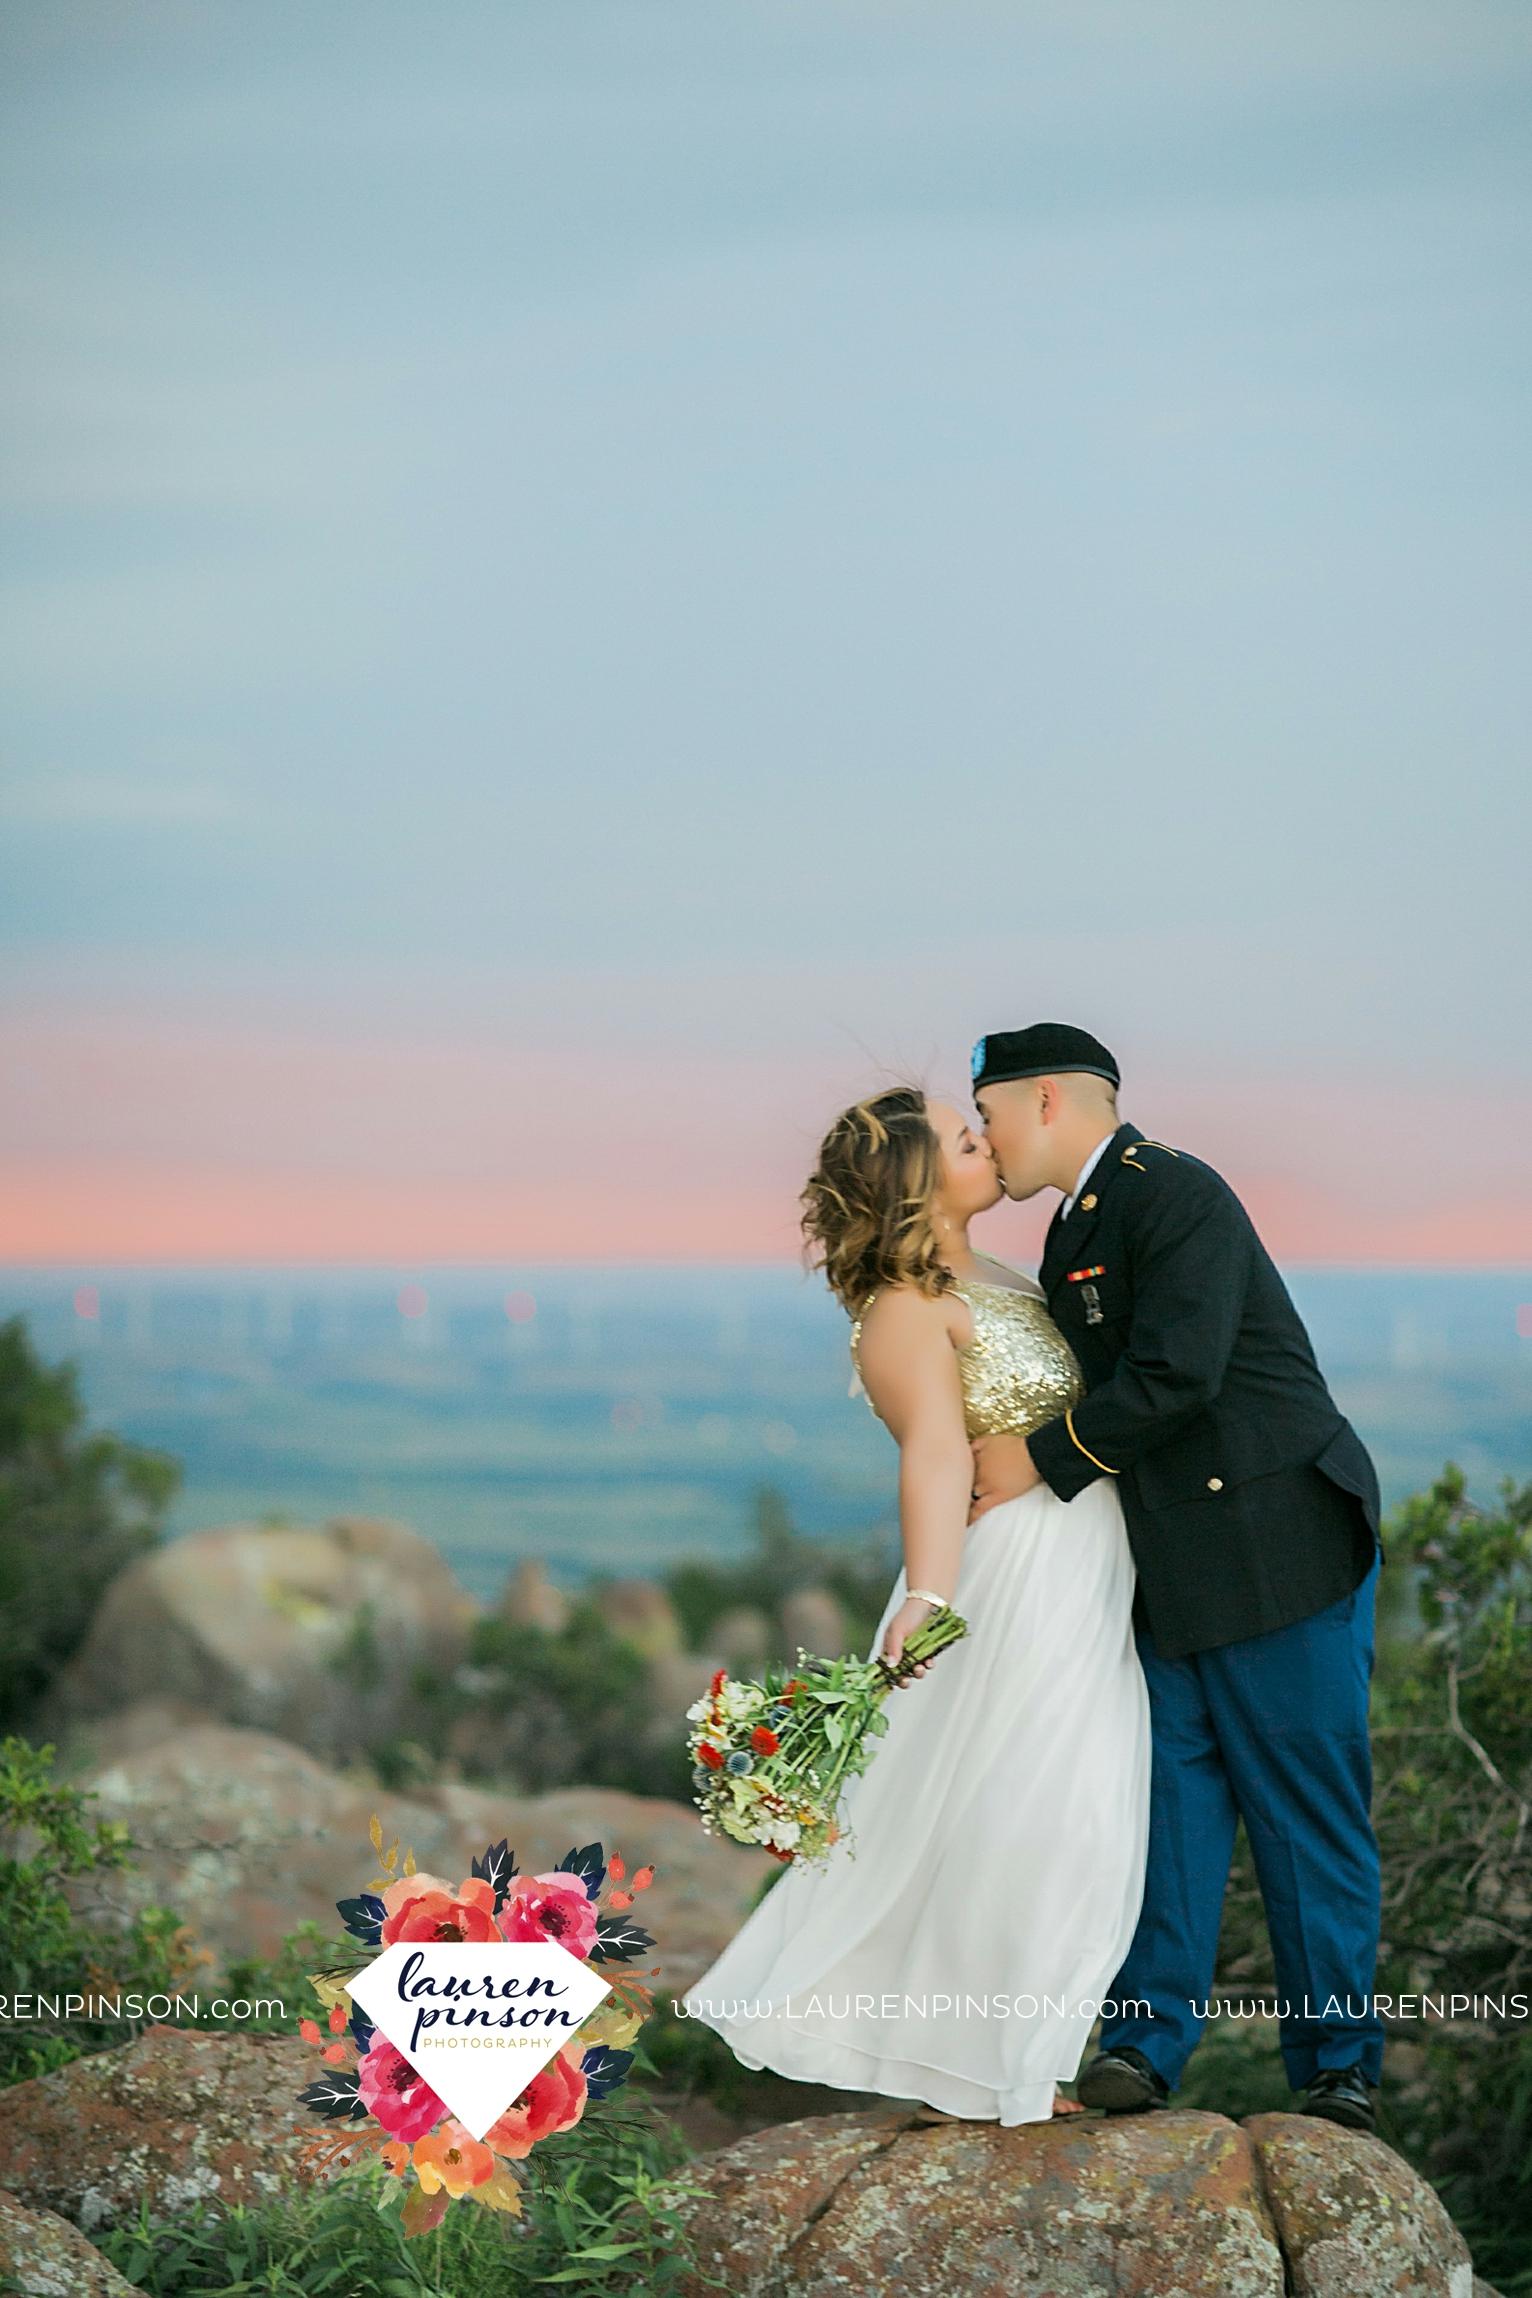 wichita-falls-texas-wedding-photography-engagement-session-army-fort-sill-lawton-oklahoma-wichita-mountains-newlyweds-00012.jpg